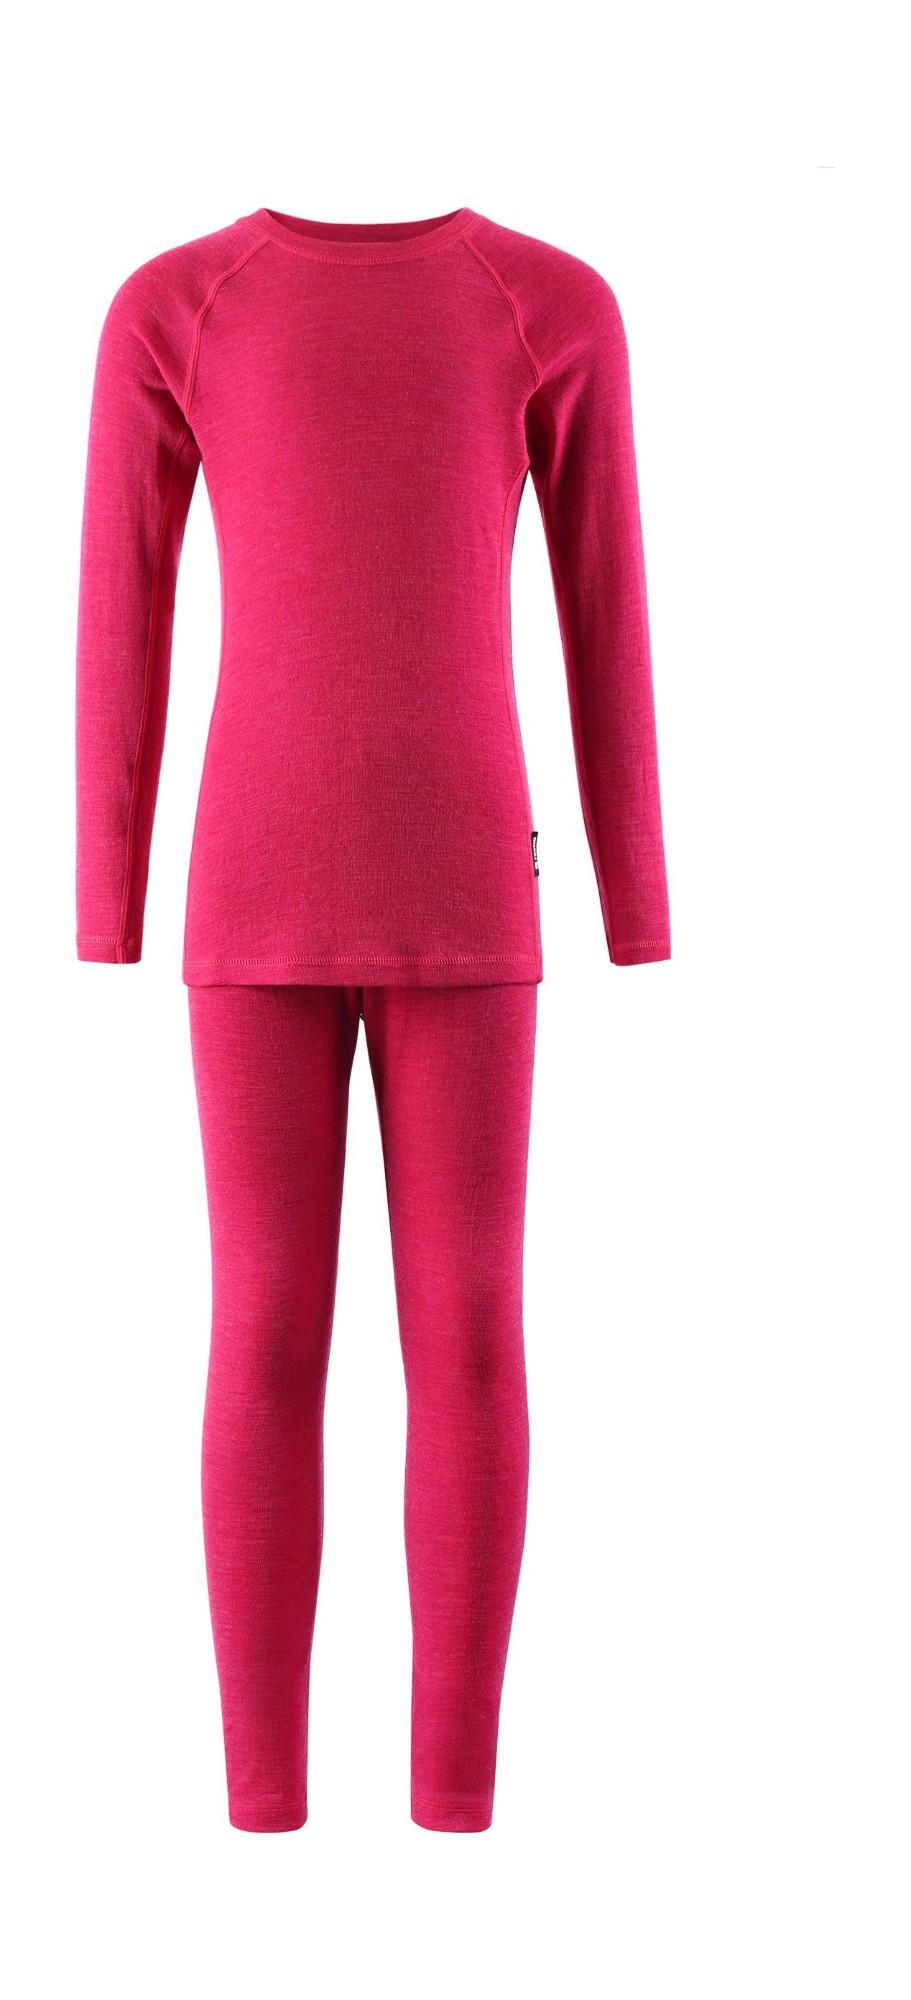 REIMA Kinsei Raspberry Pink 100